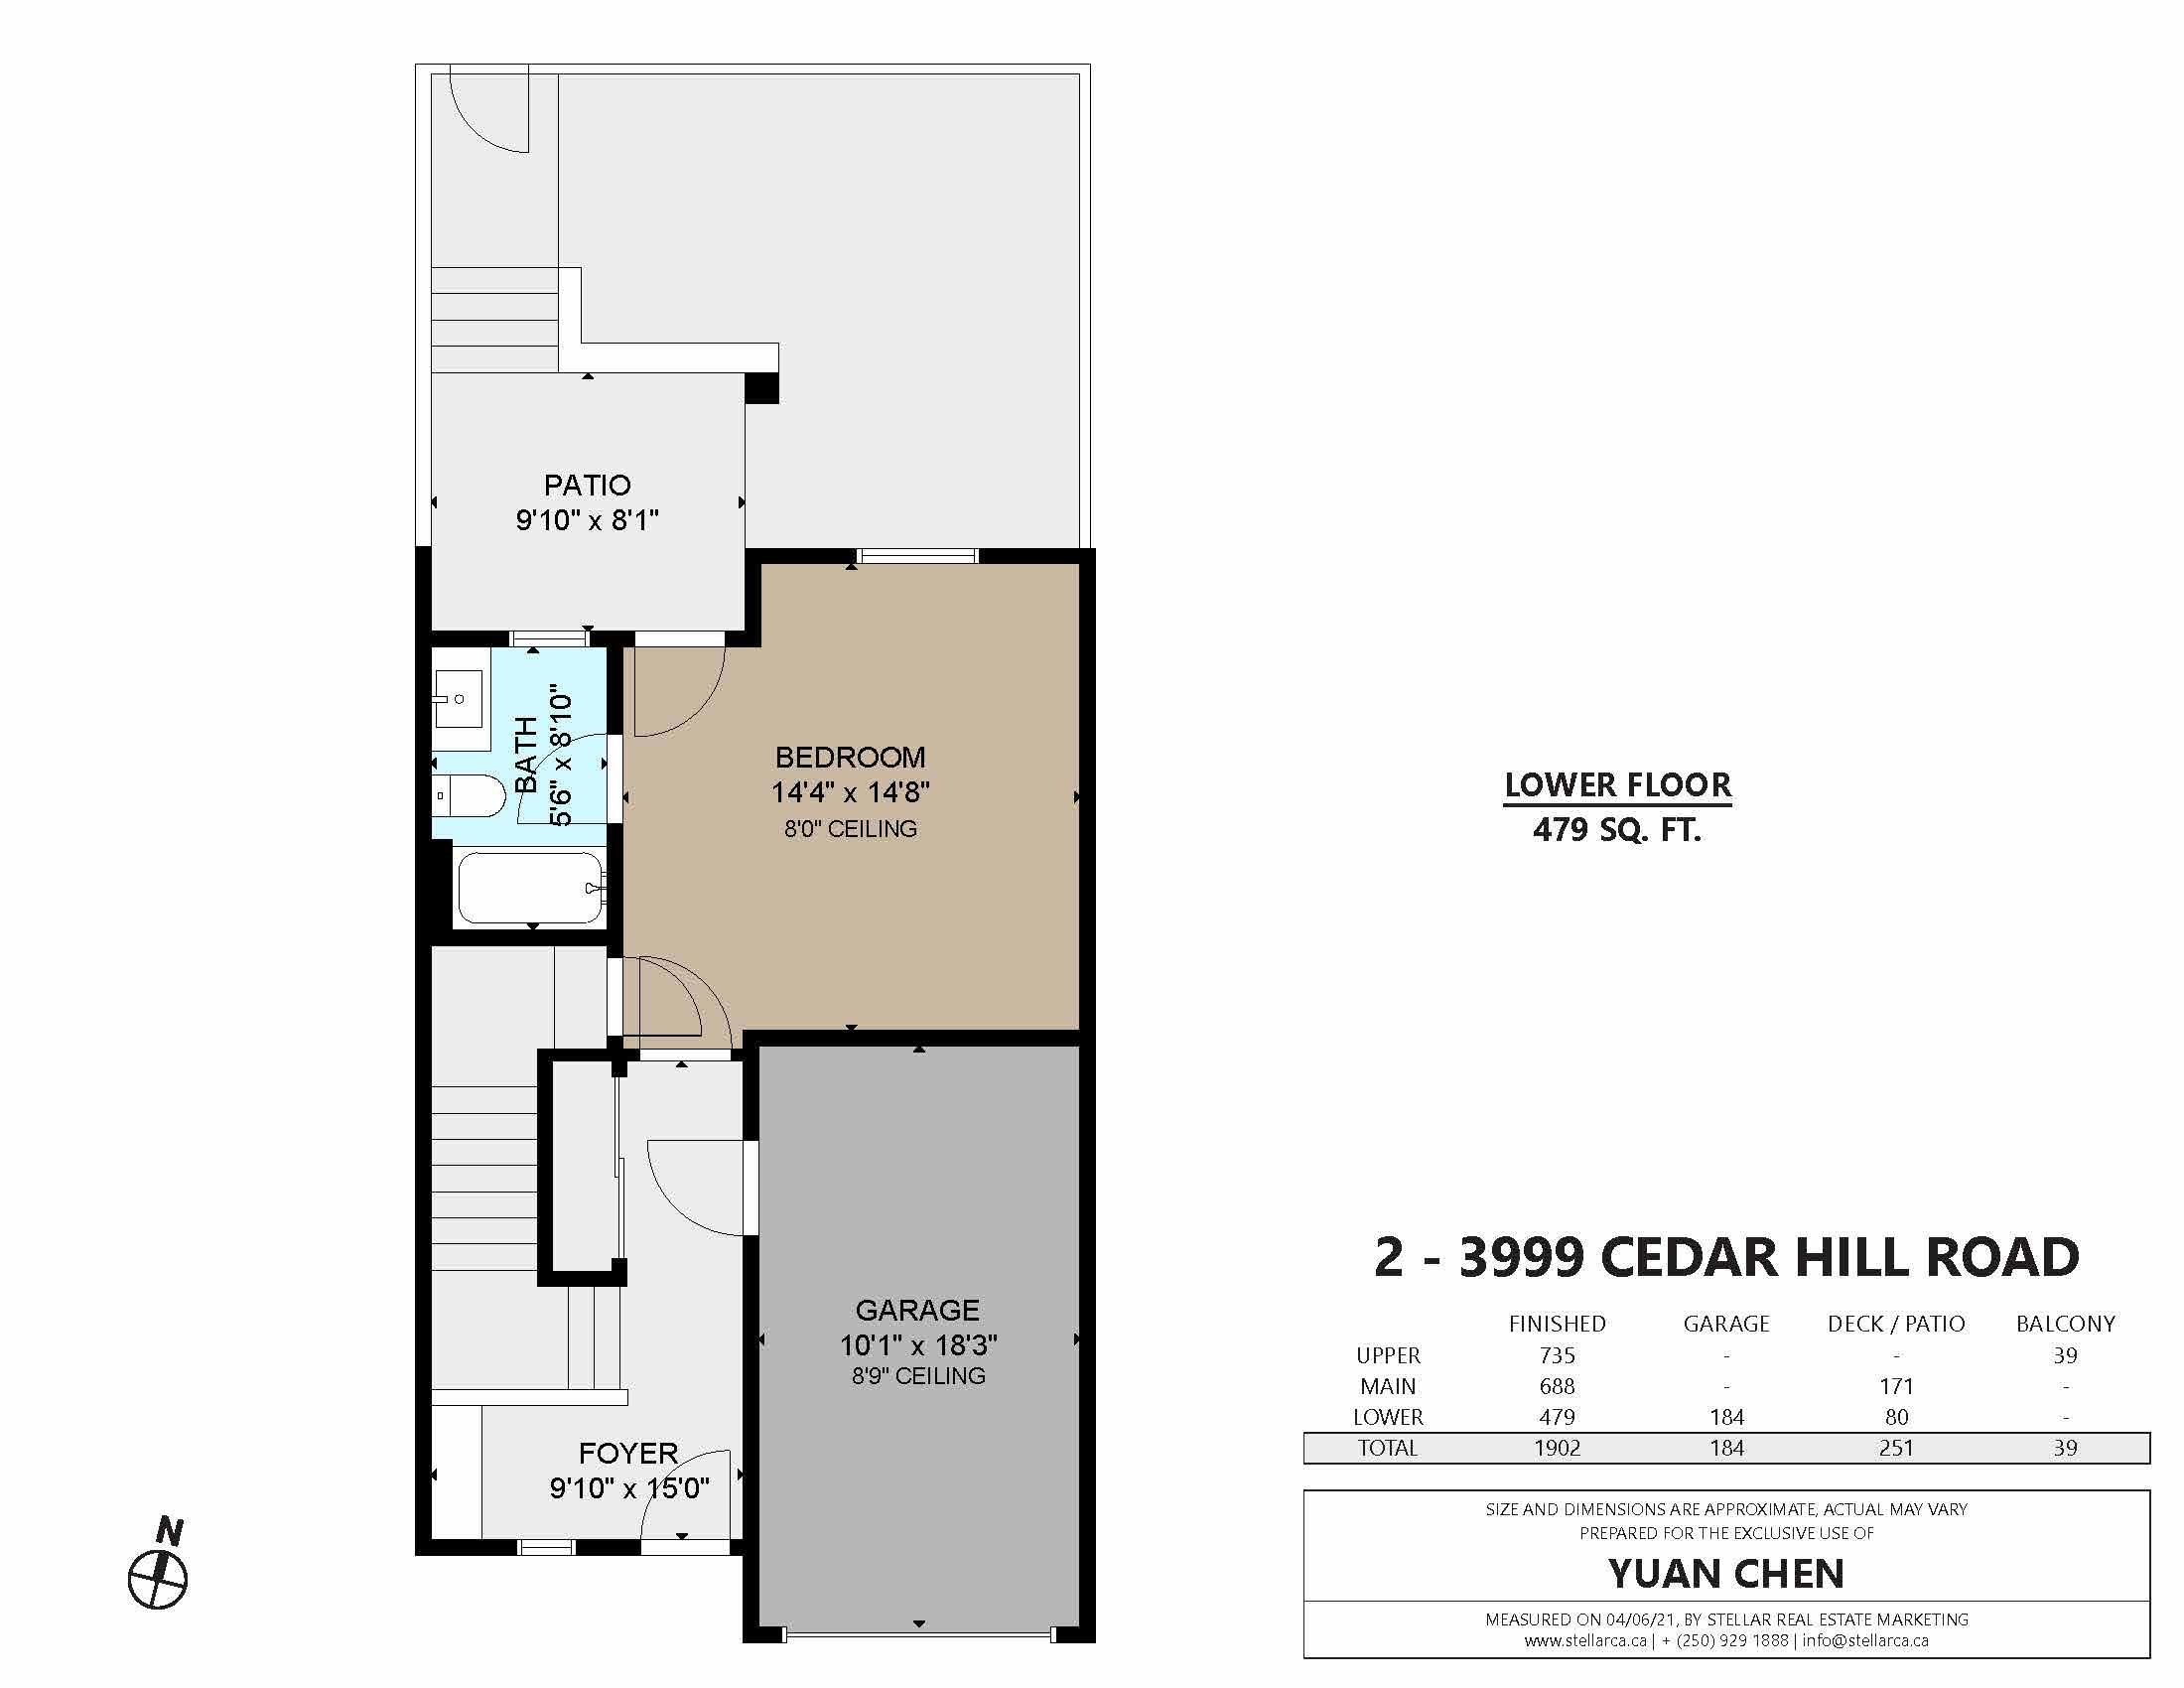 2 3999 Cedar Hill Rd